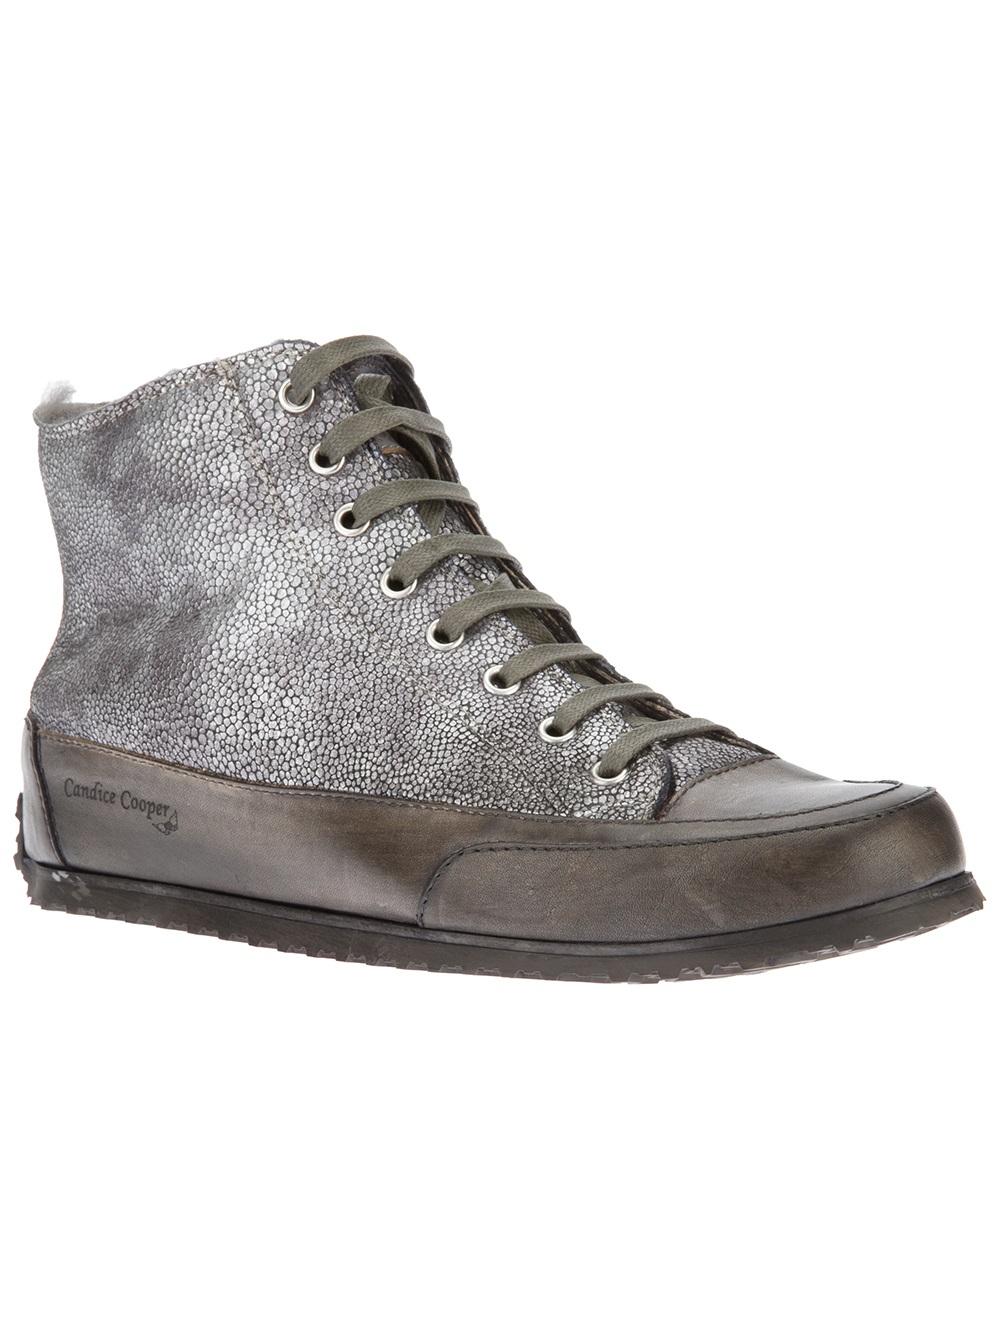 candice cooper metallic high top sneakers in gray lyst. Black Bedroom Furniture Sets. Home Design Ideas